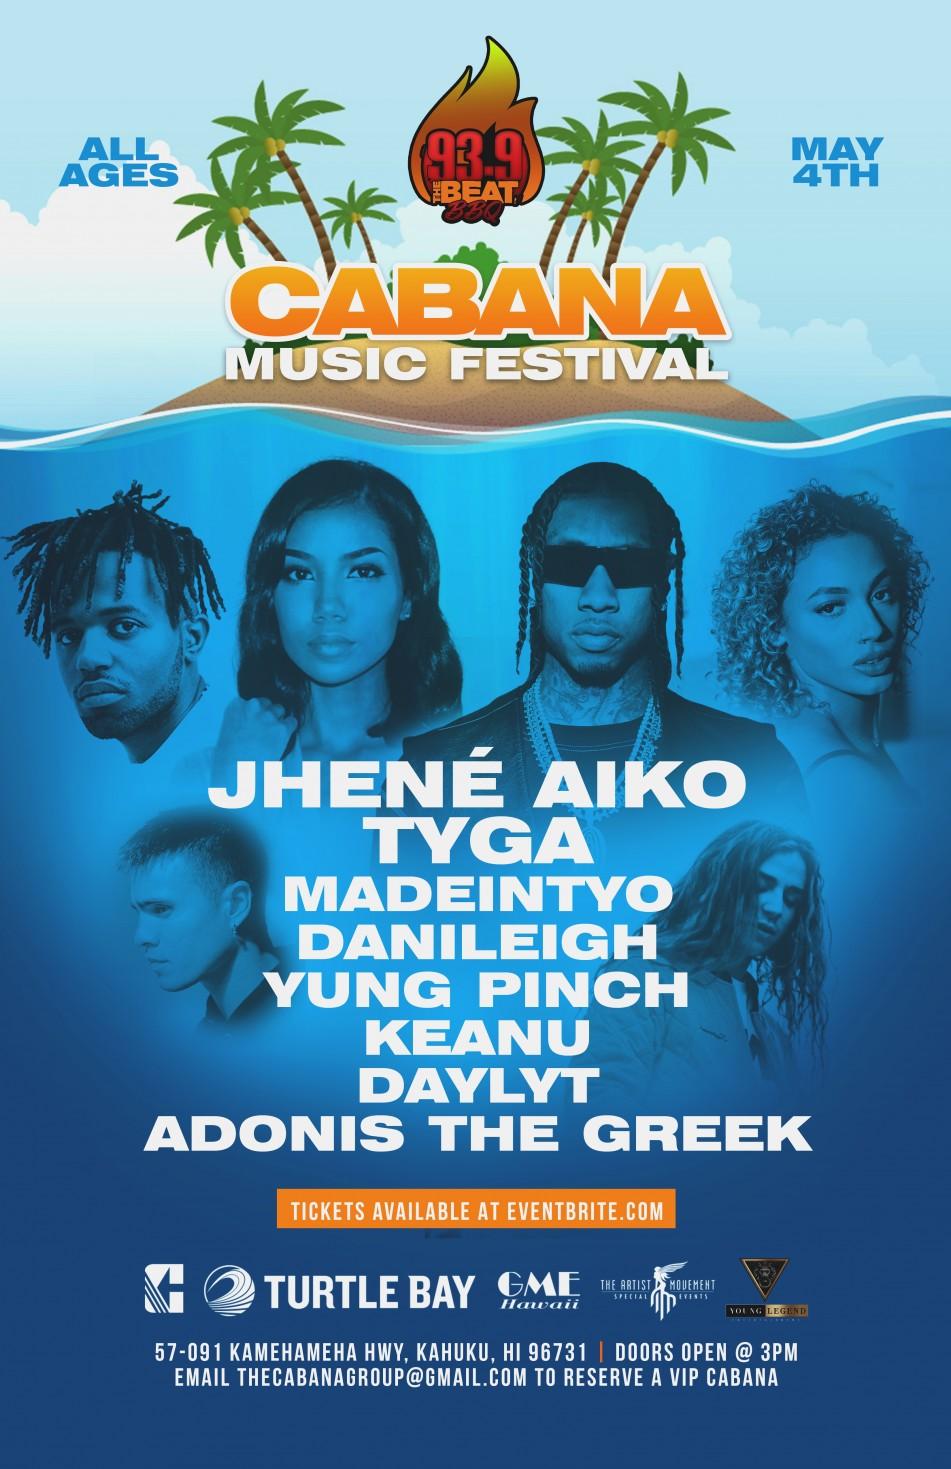 Cabana Music Festival